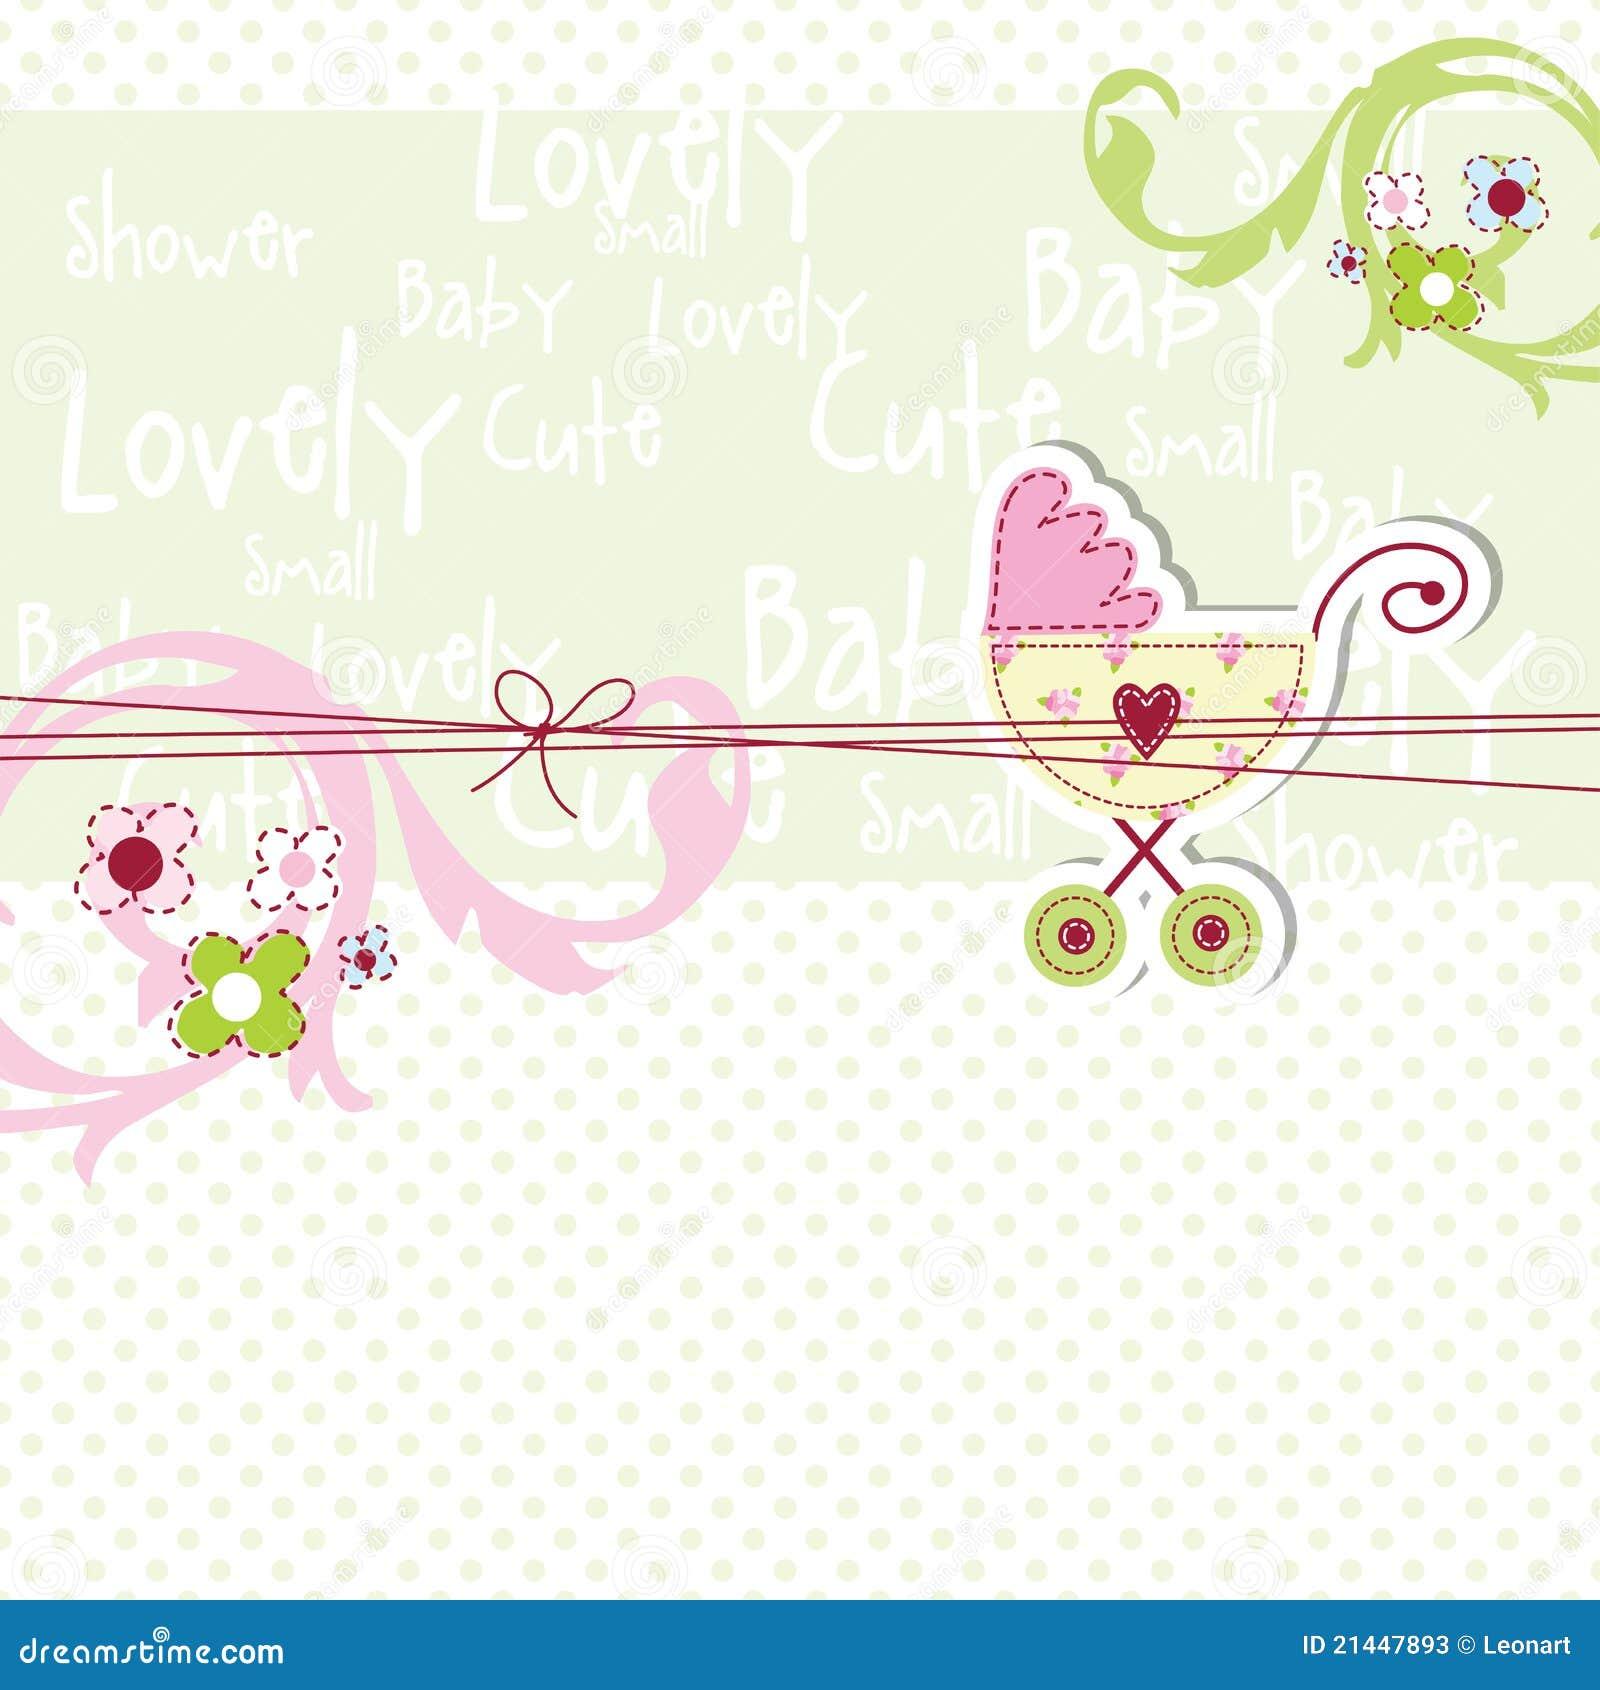 Stock photos baby shower card